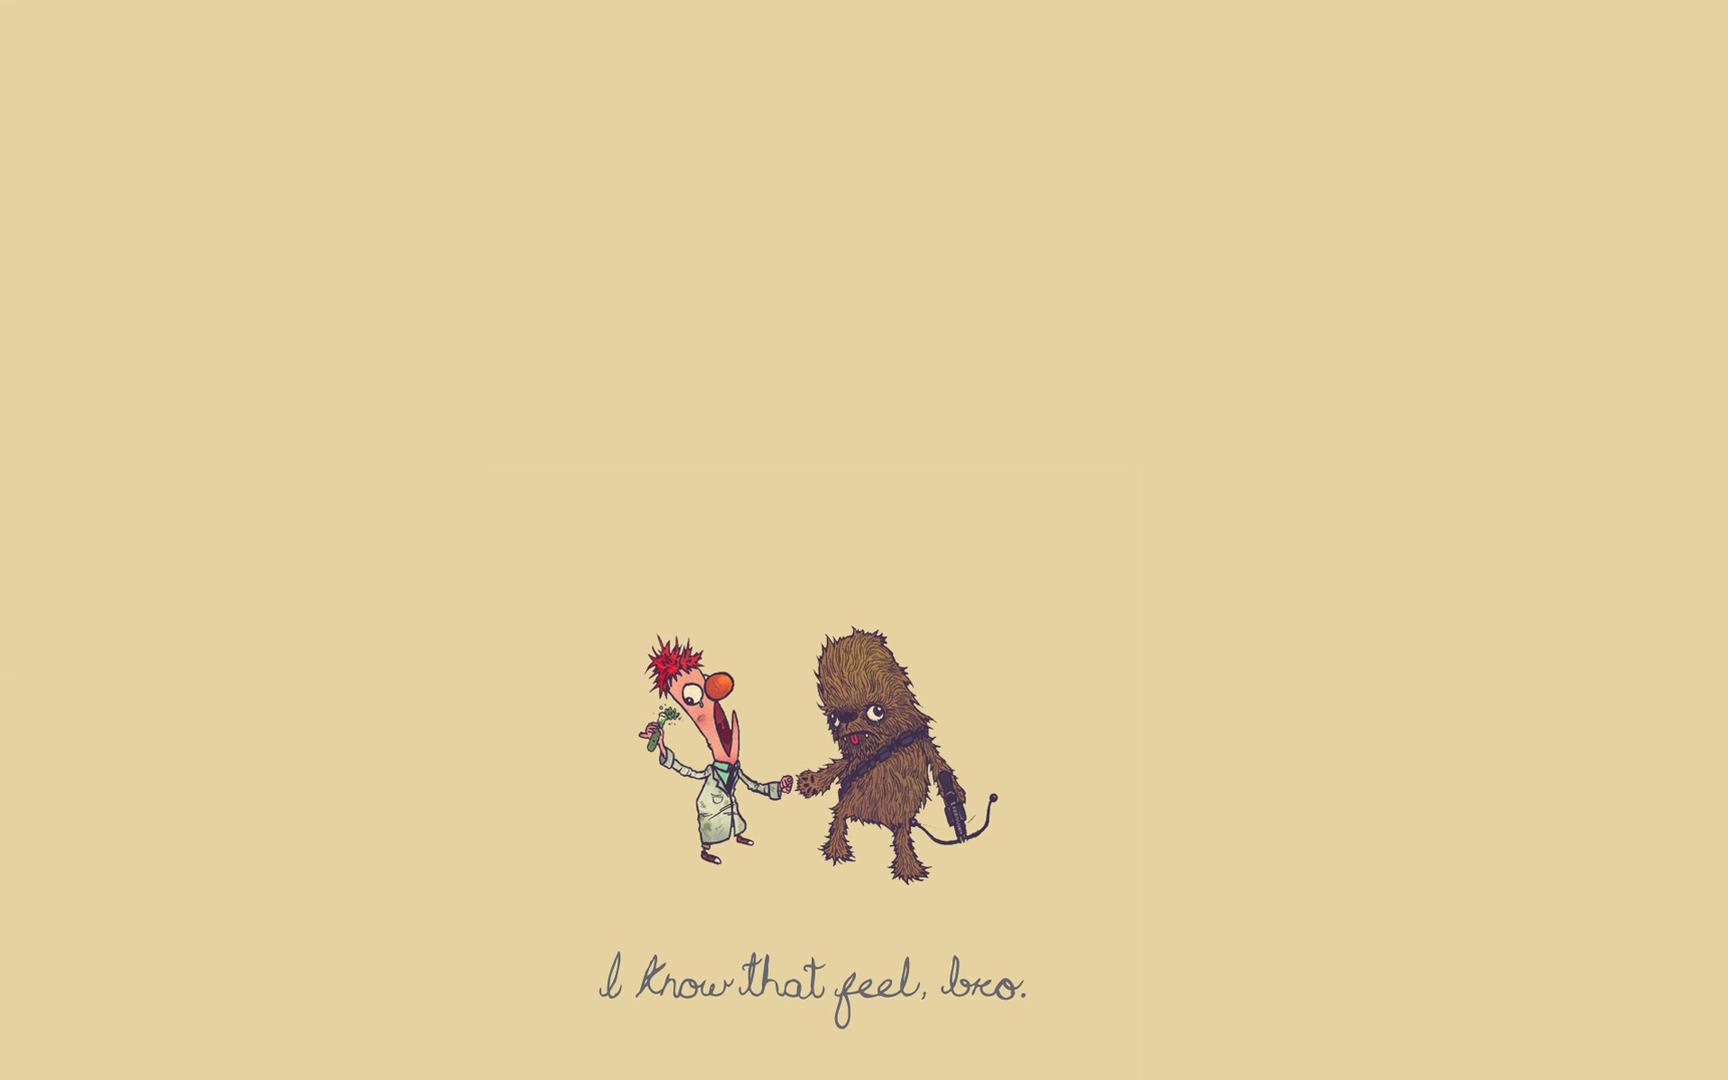 Chewbacca humor wallpaper 19294 1728x1080